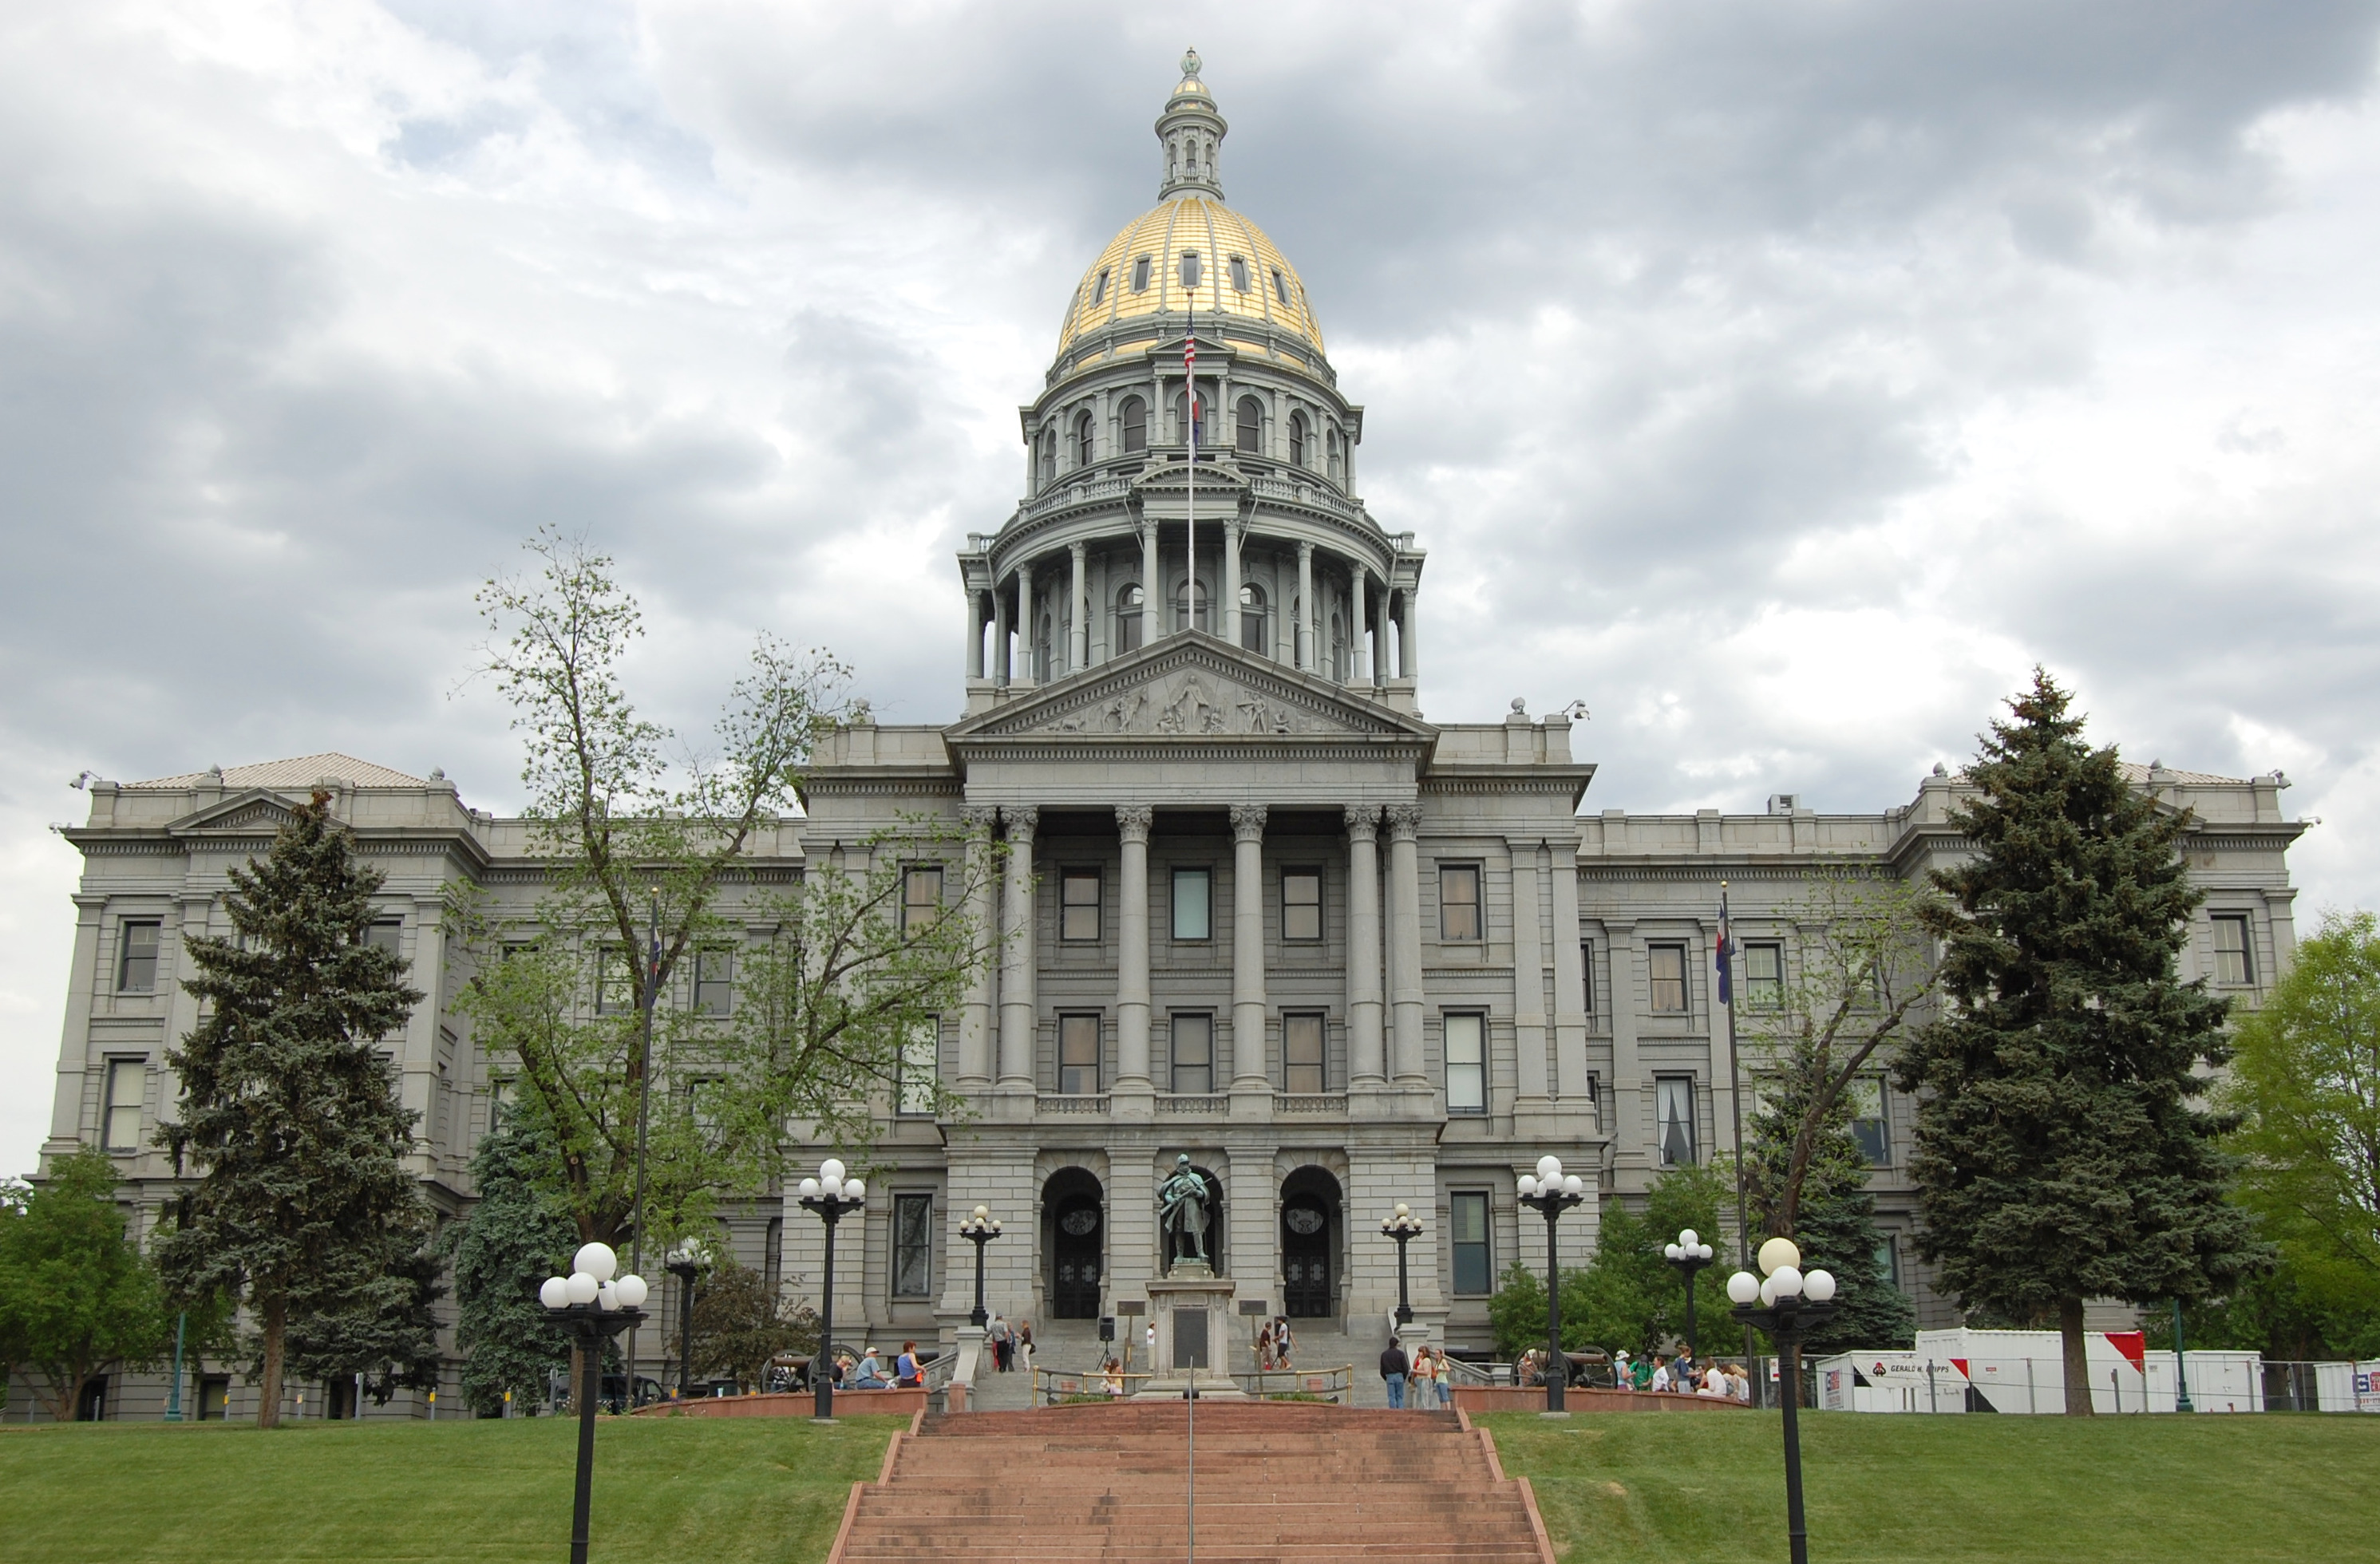 Colorado has Standing Order, Good Samaritan Law for Naloxone